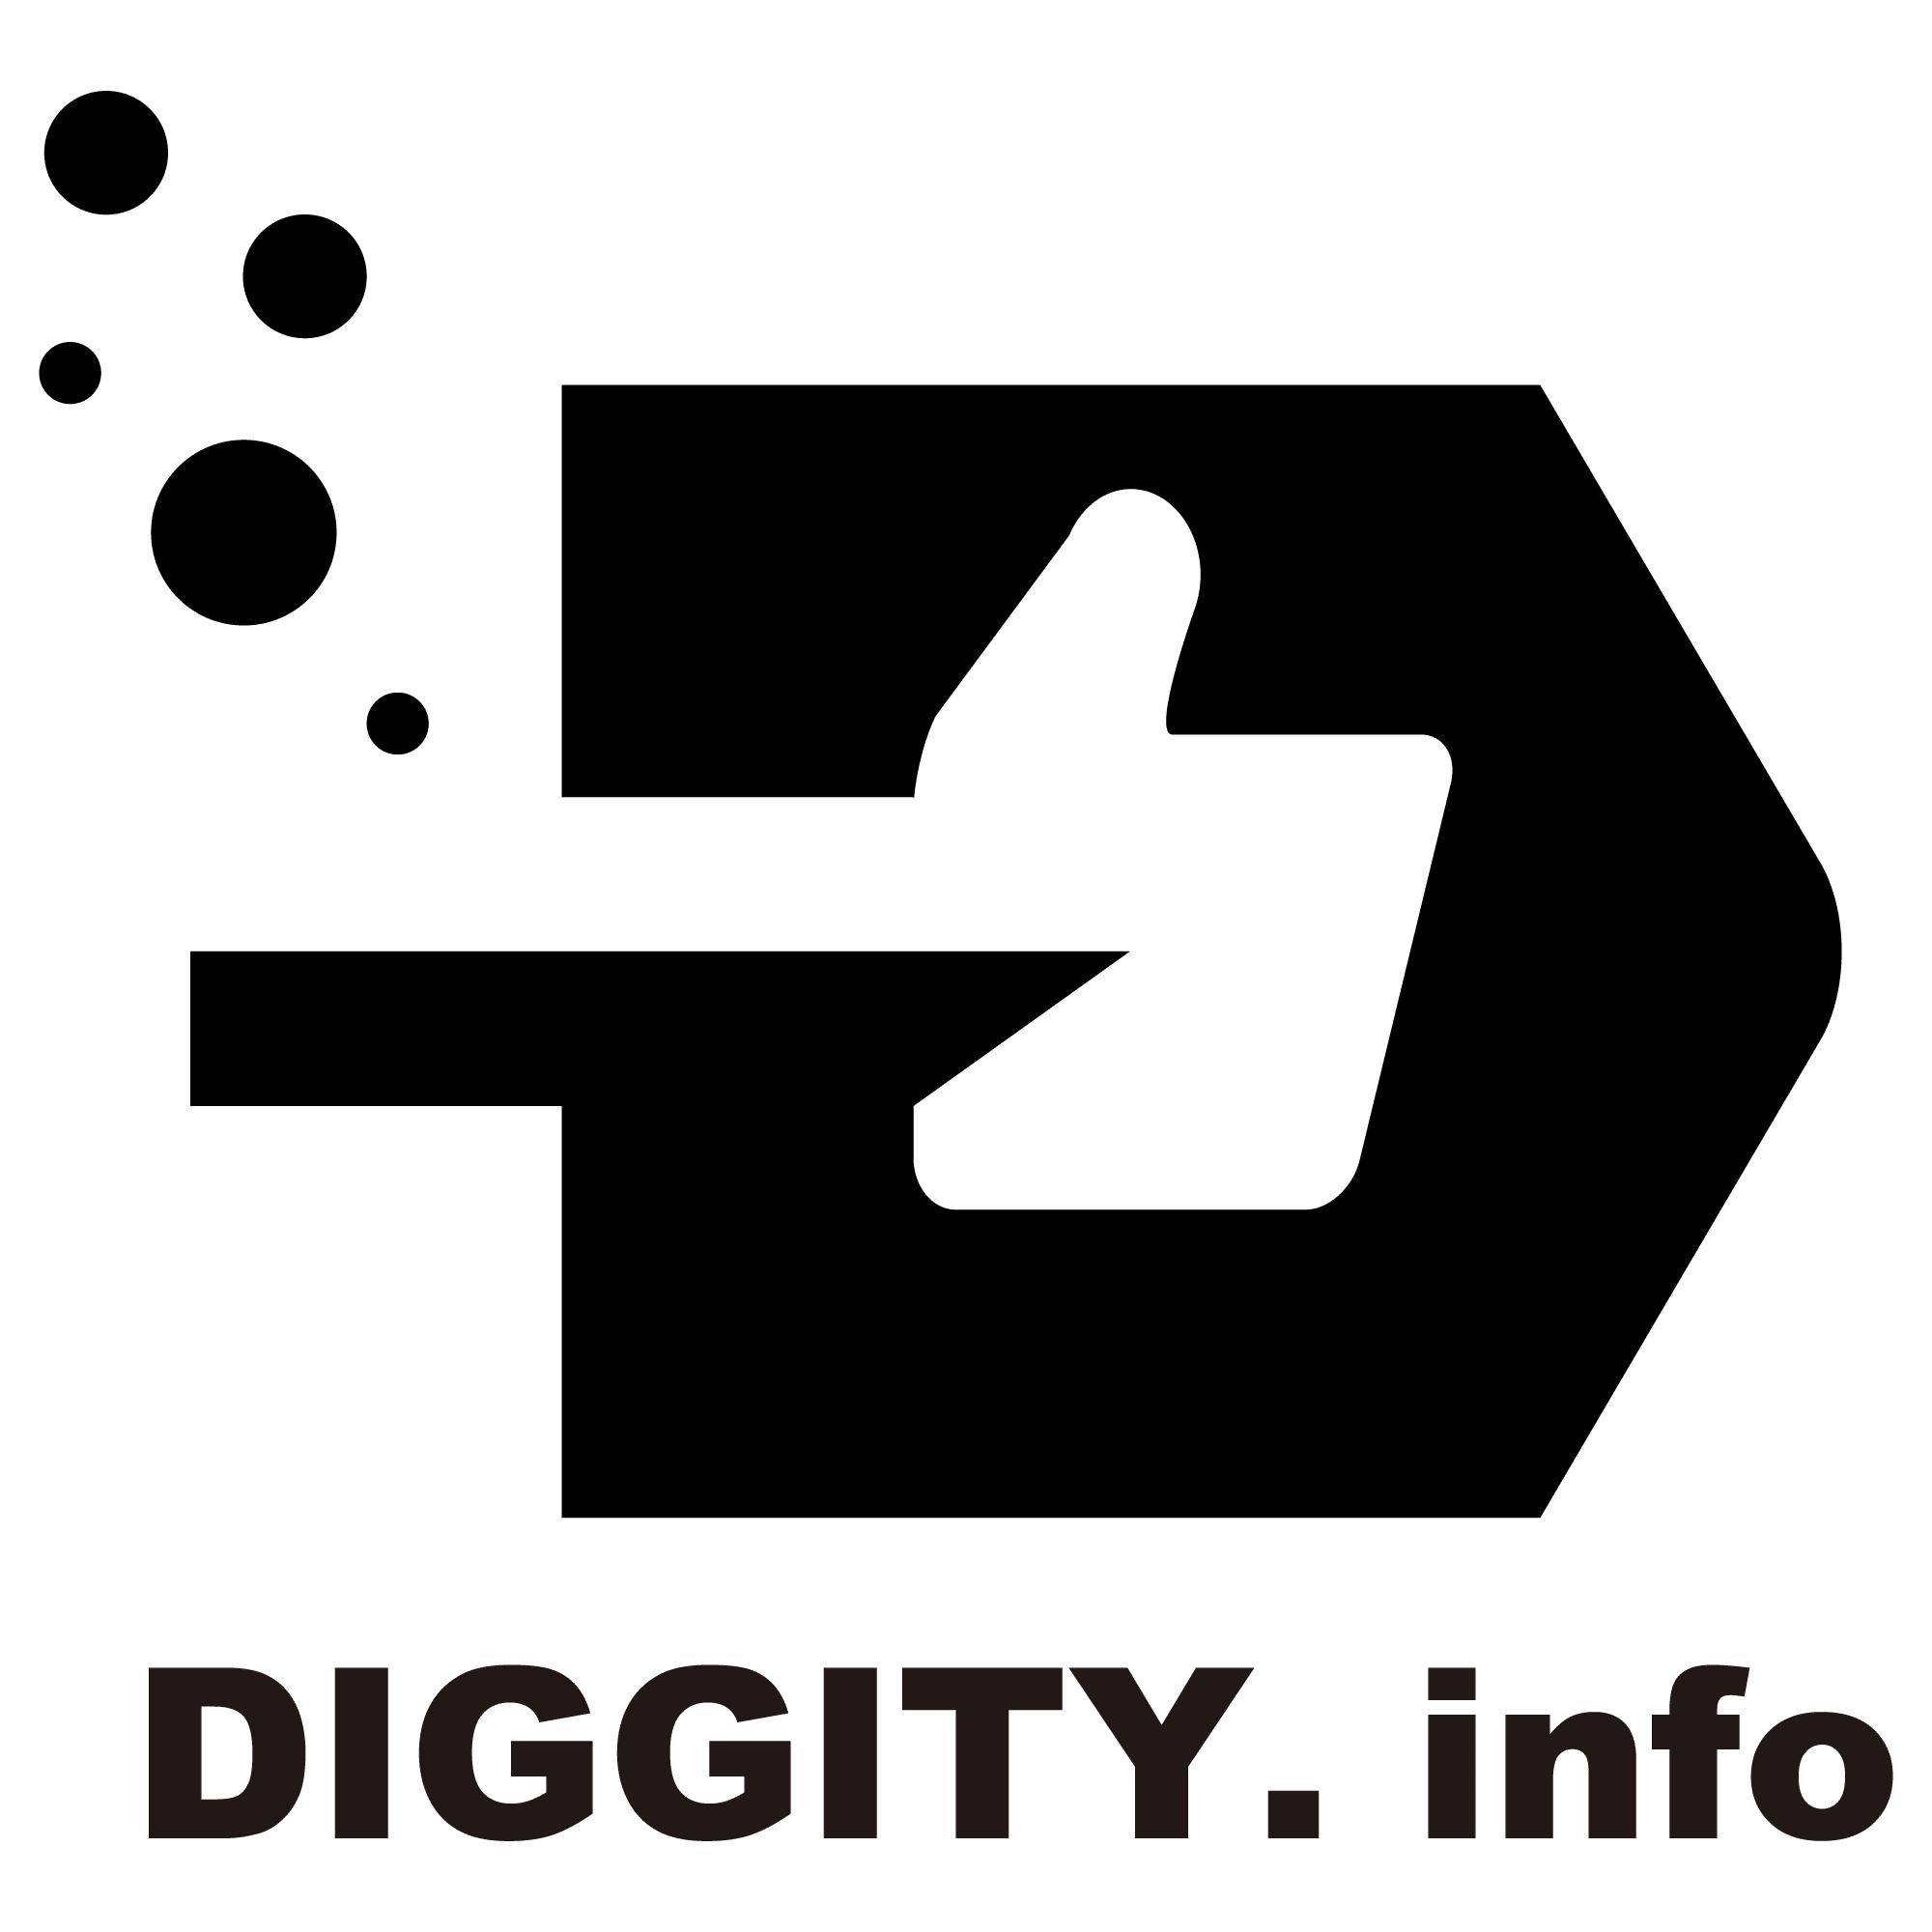 DIGGITY.INFO